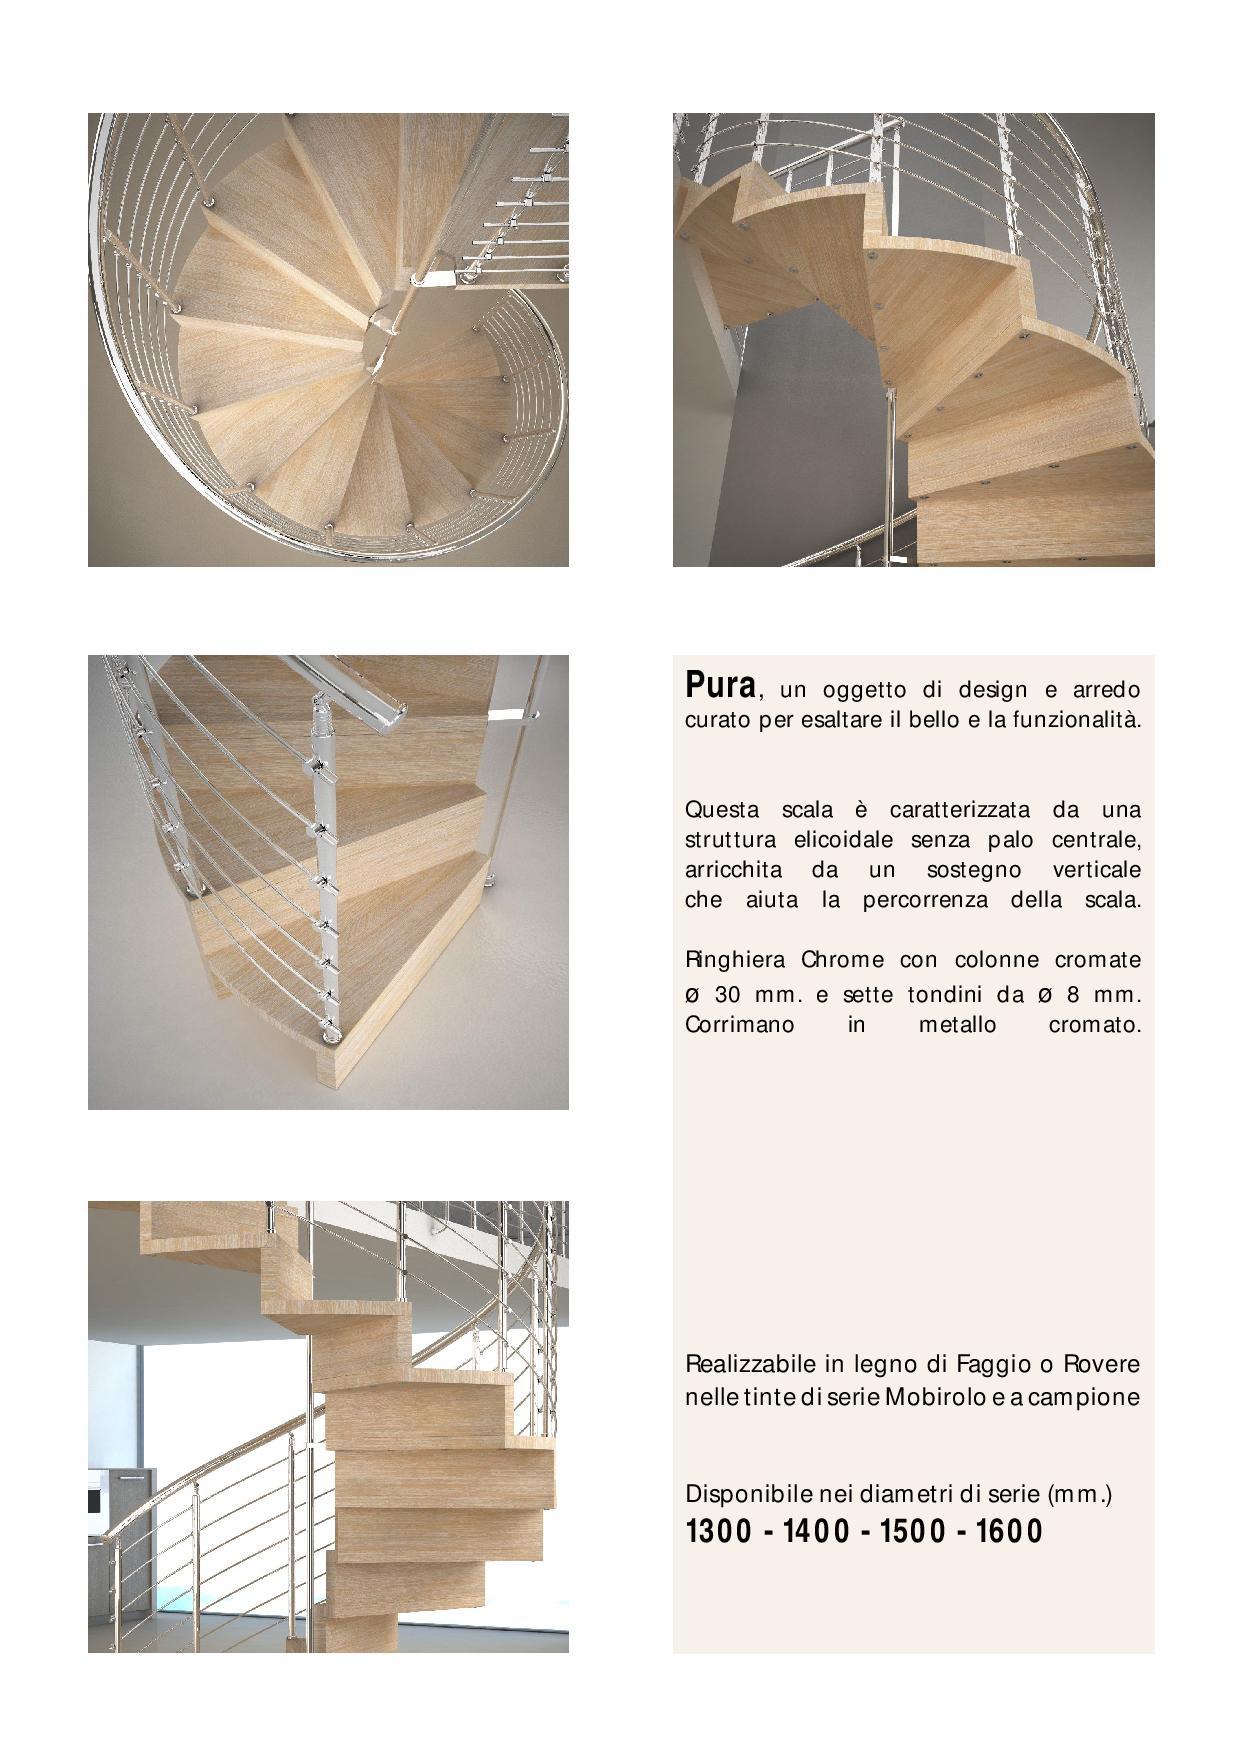 LP_Pura_catalogo-page-003